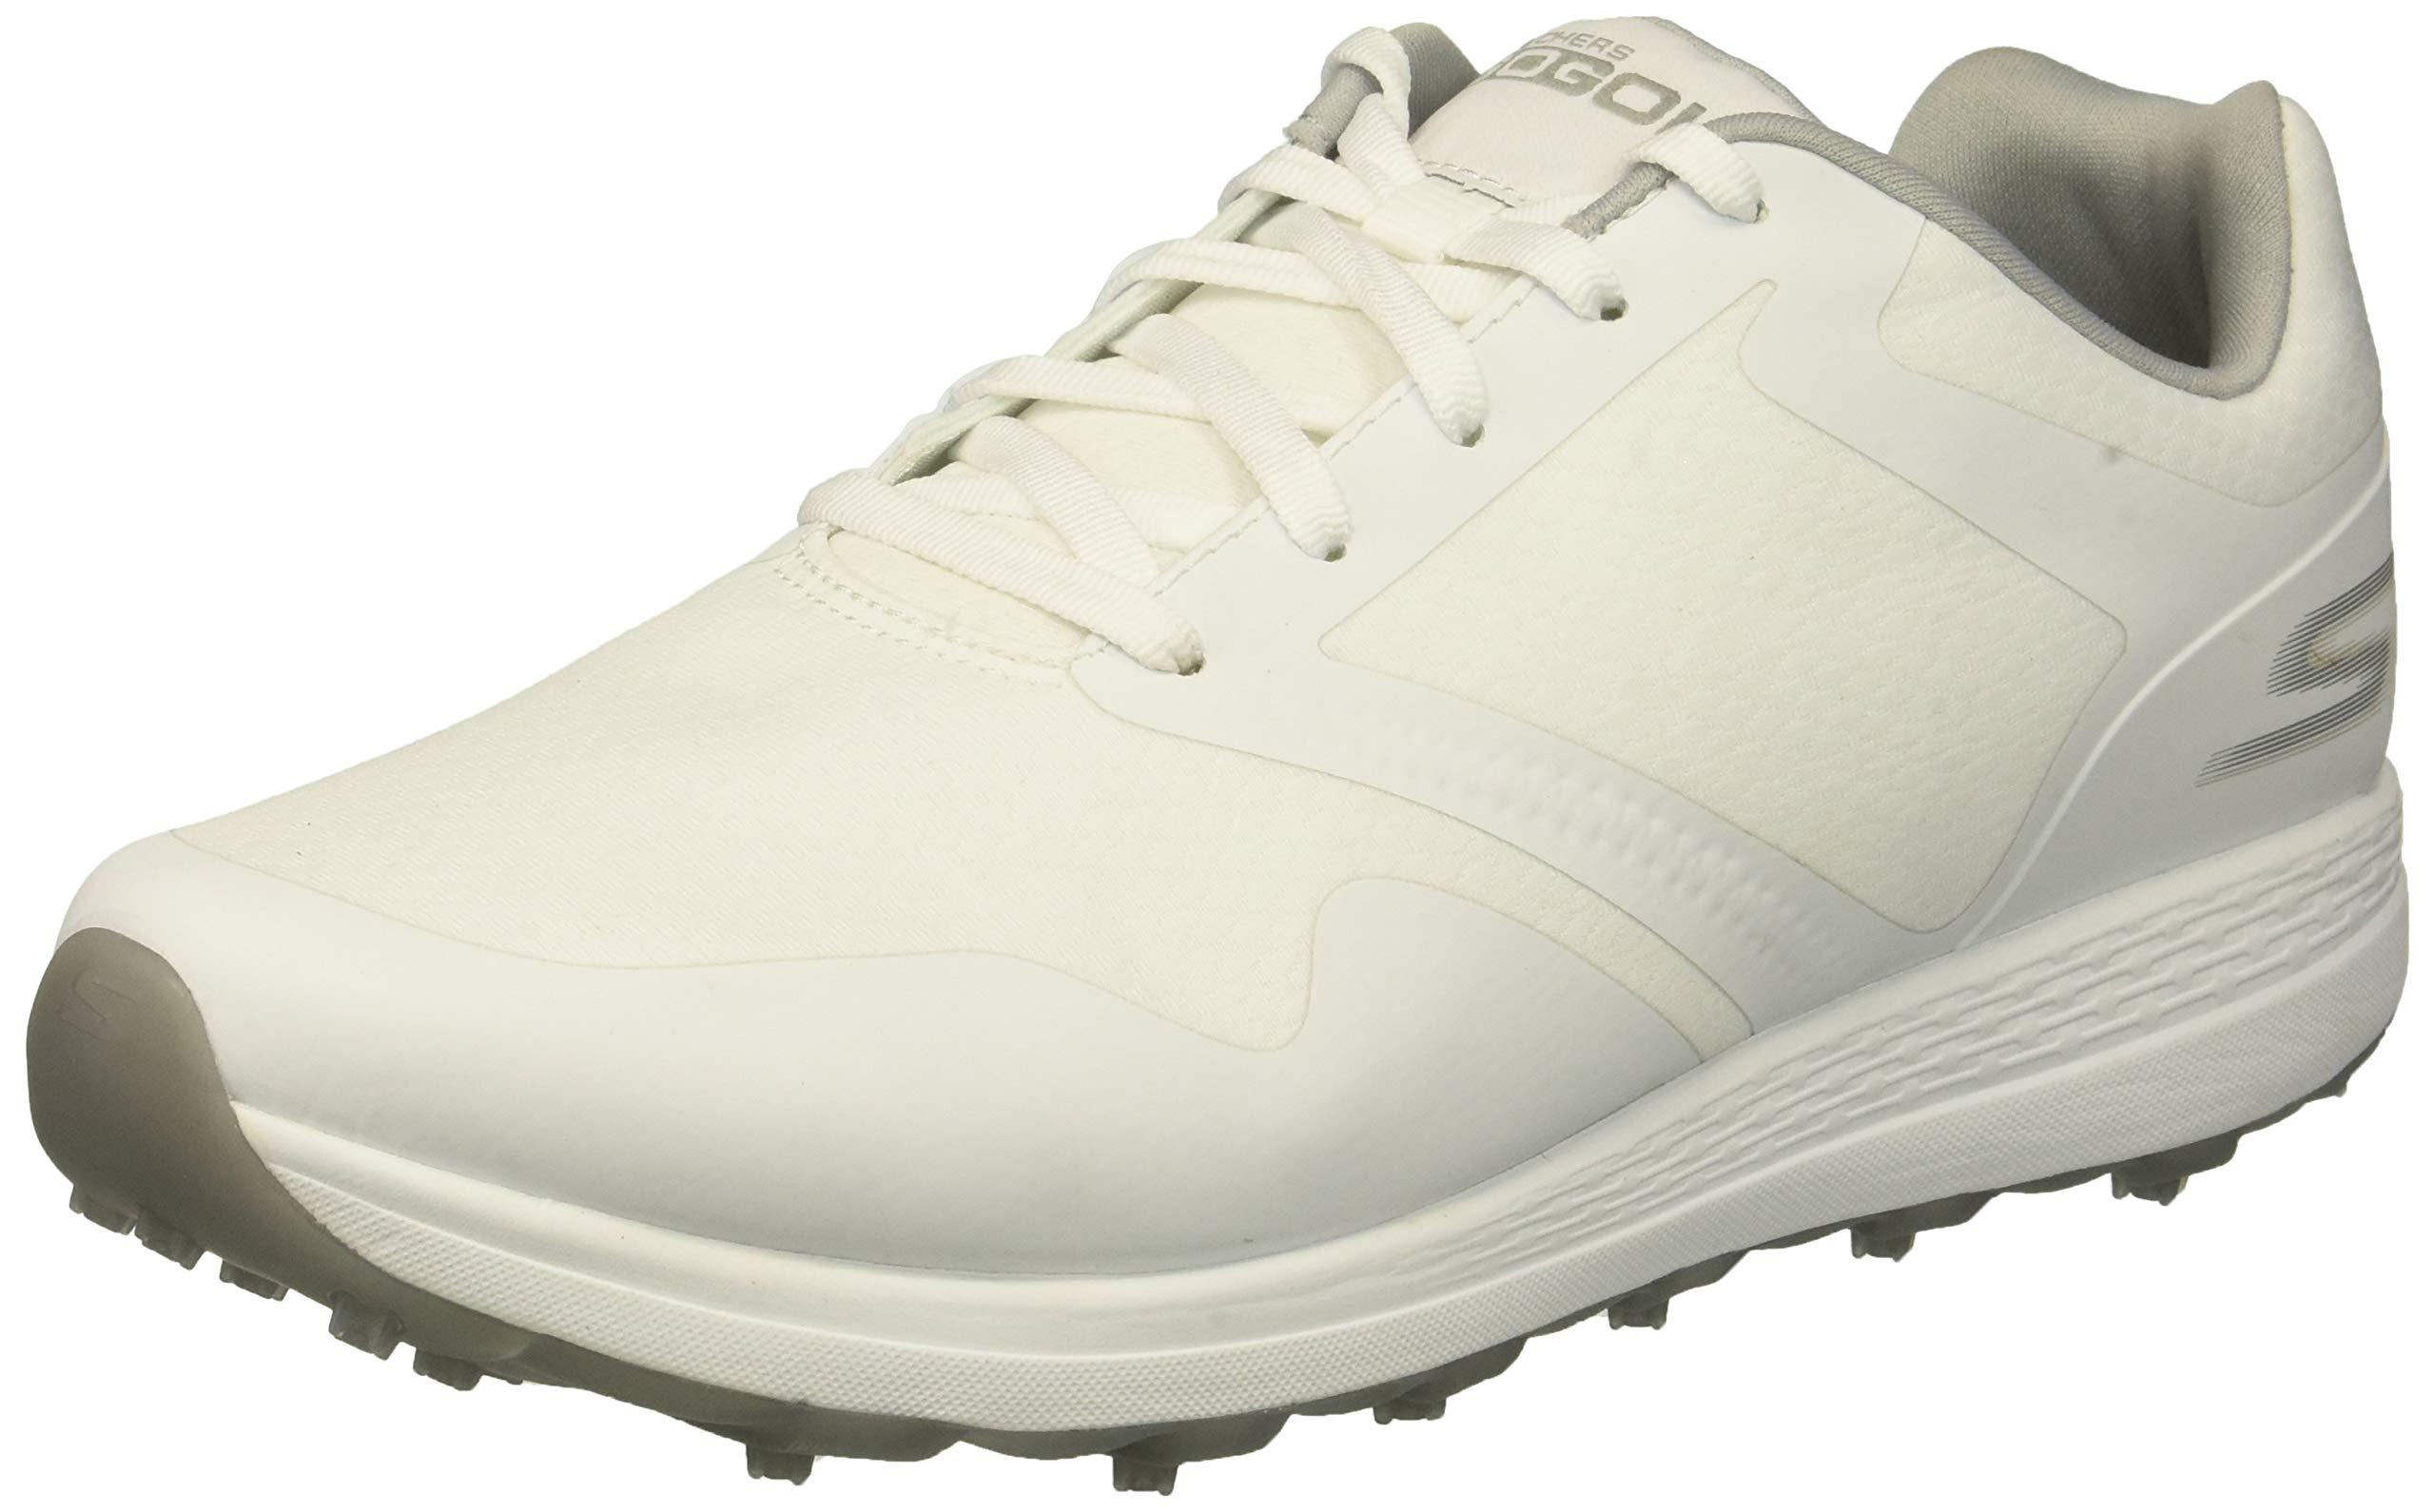 Skechers Women's Max Golf Shoe, White/Gray, 8.5 M US by Skechers